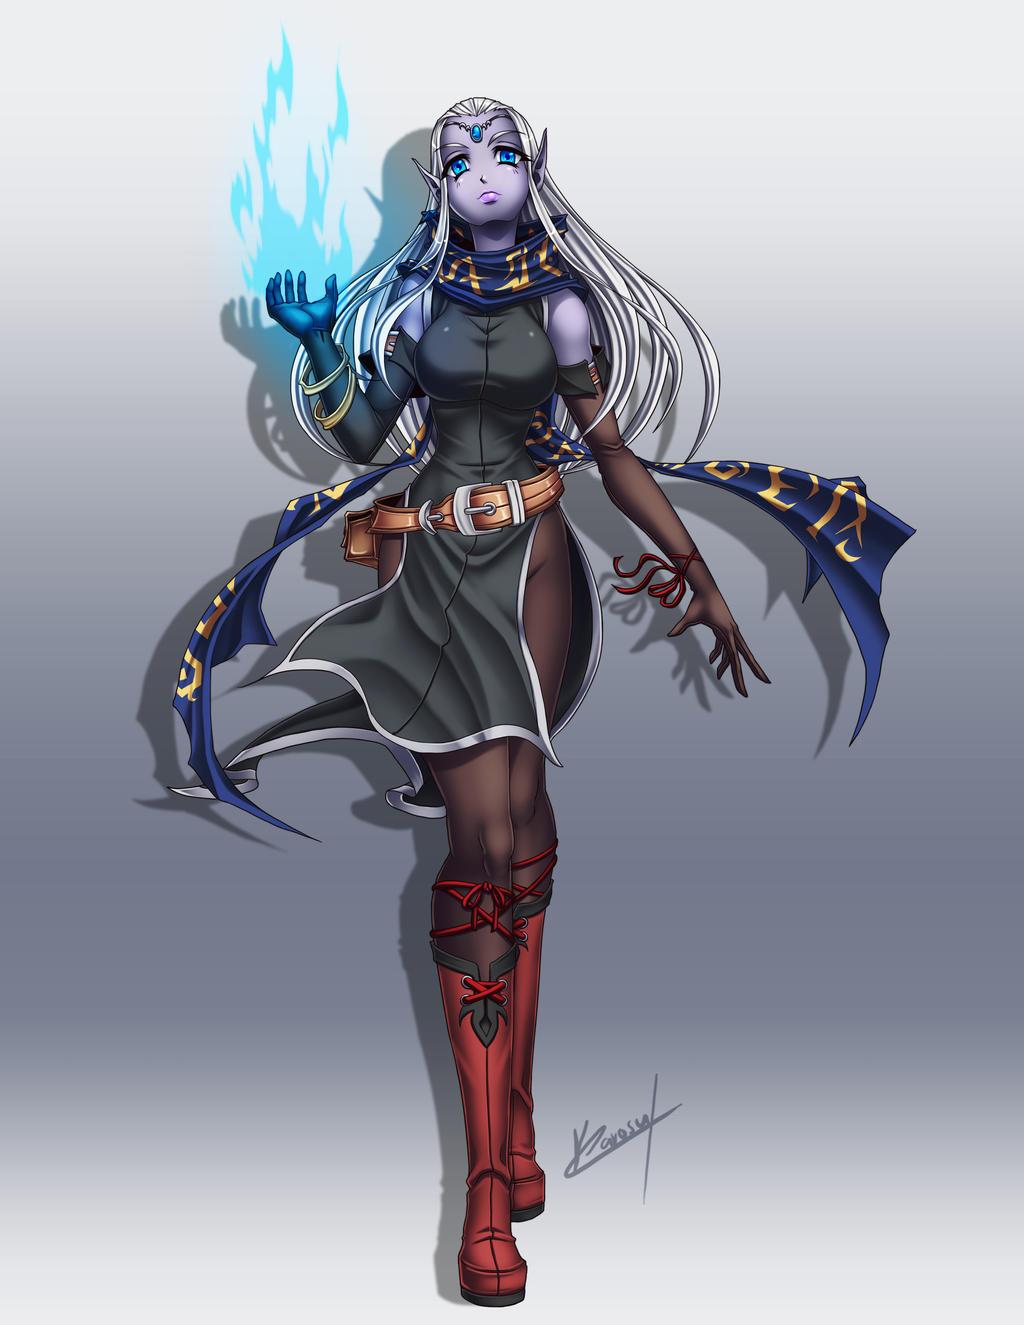 Girl Very Hot-36931